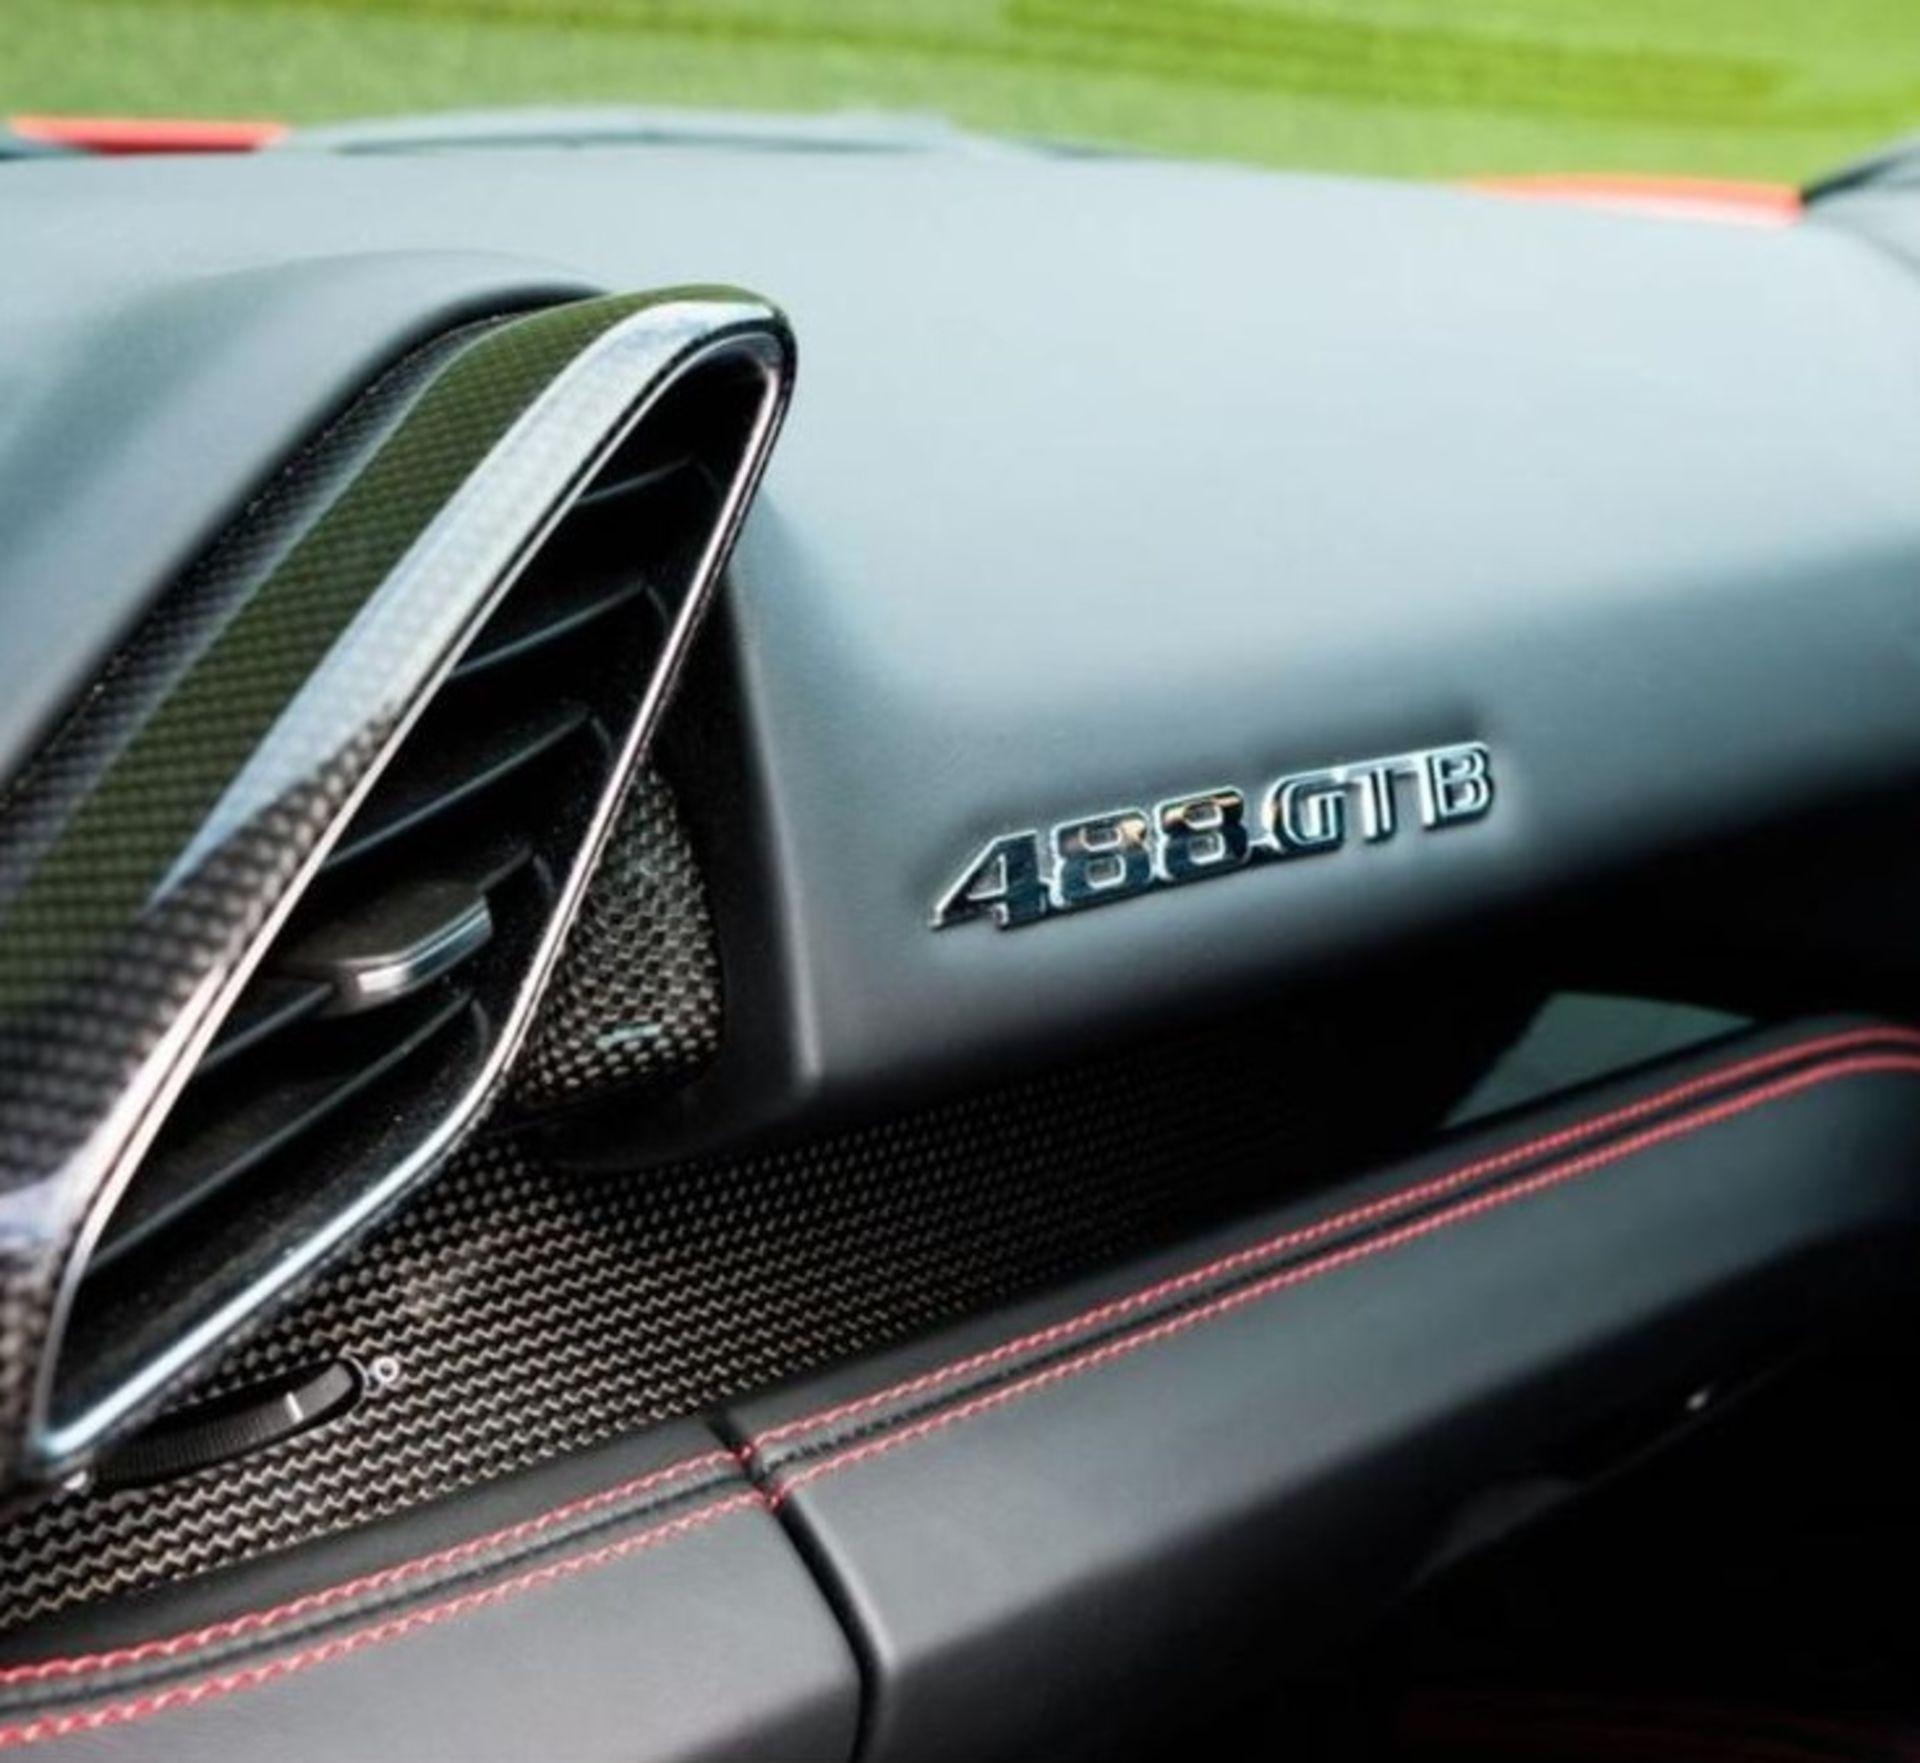 2016 FERRARI 488 GTB 2DR RED COUPE, PETROL, AUTOMATIC, 11K MILES, LEFT HAND DRIVE *NO VAT* - Image 18 of 22